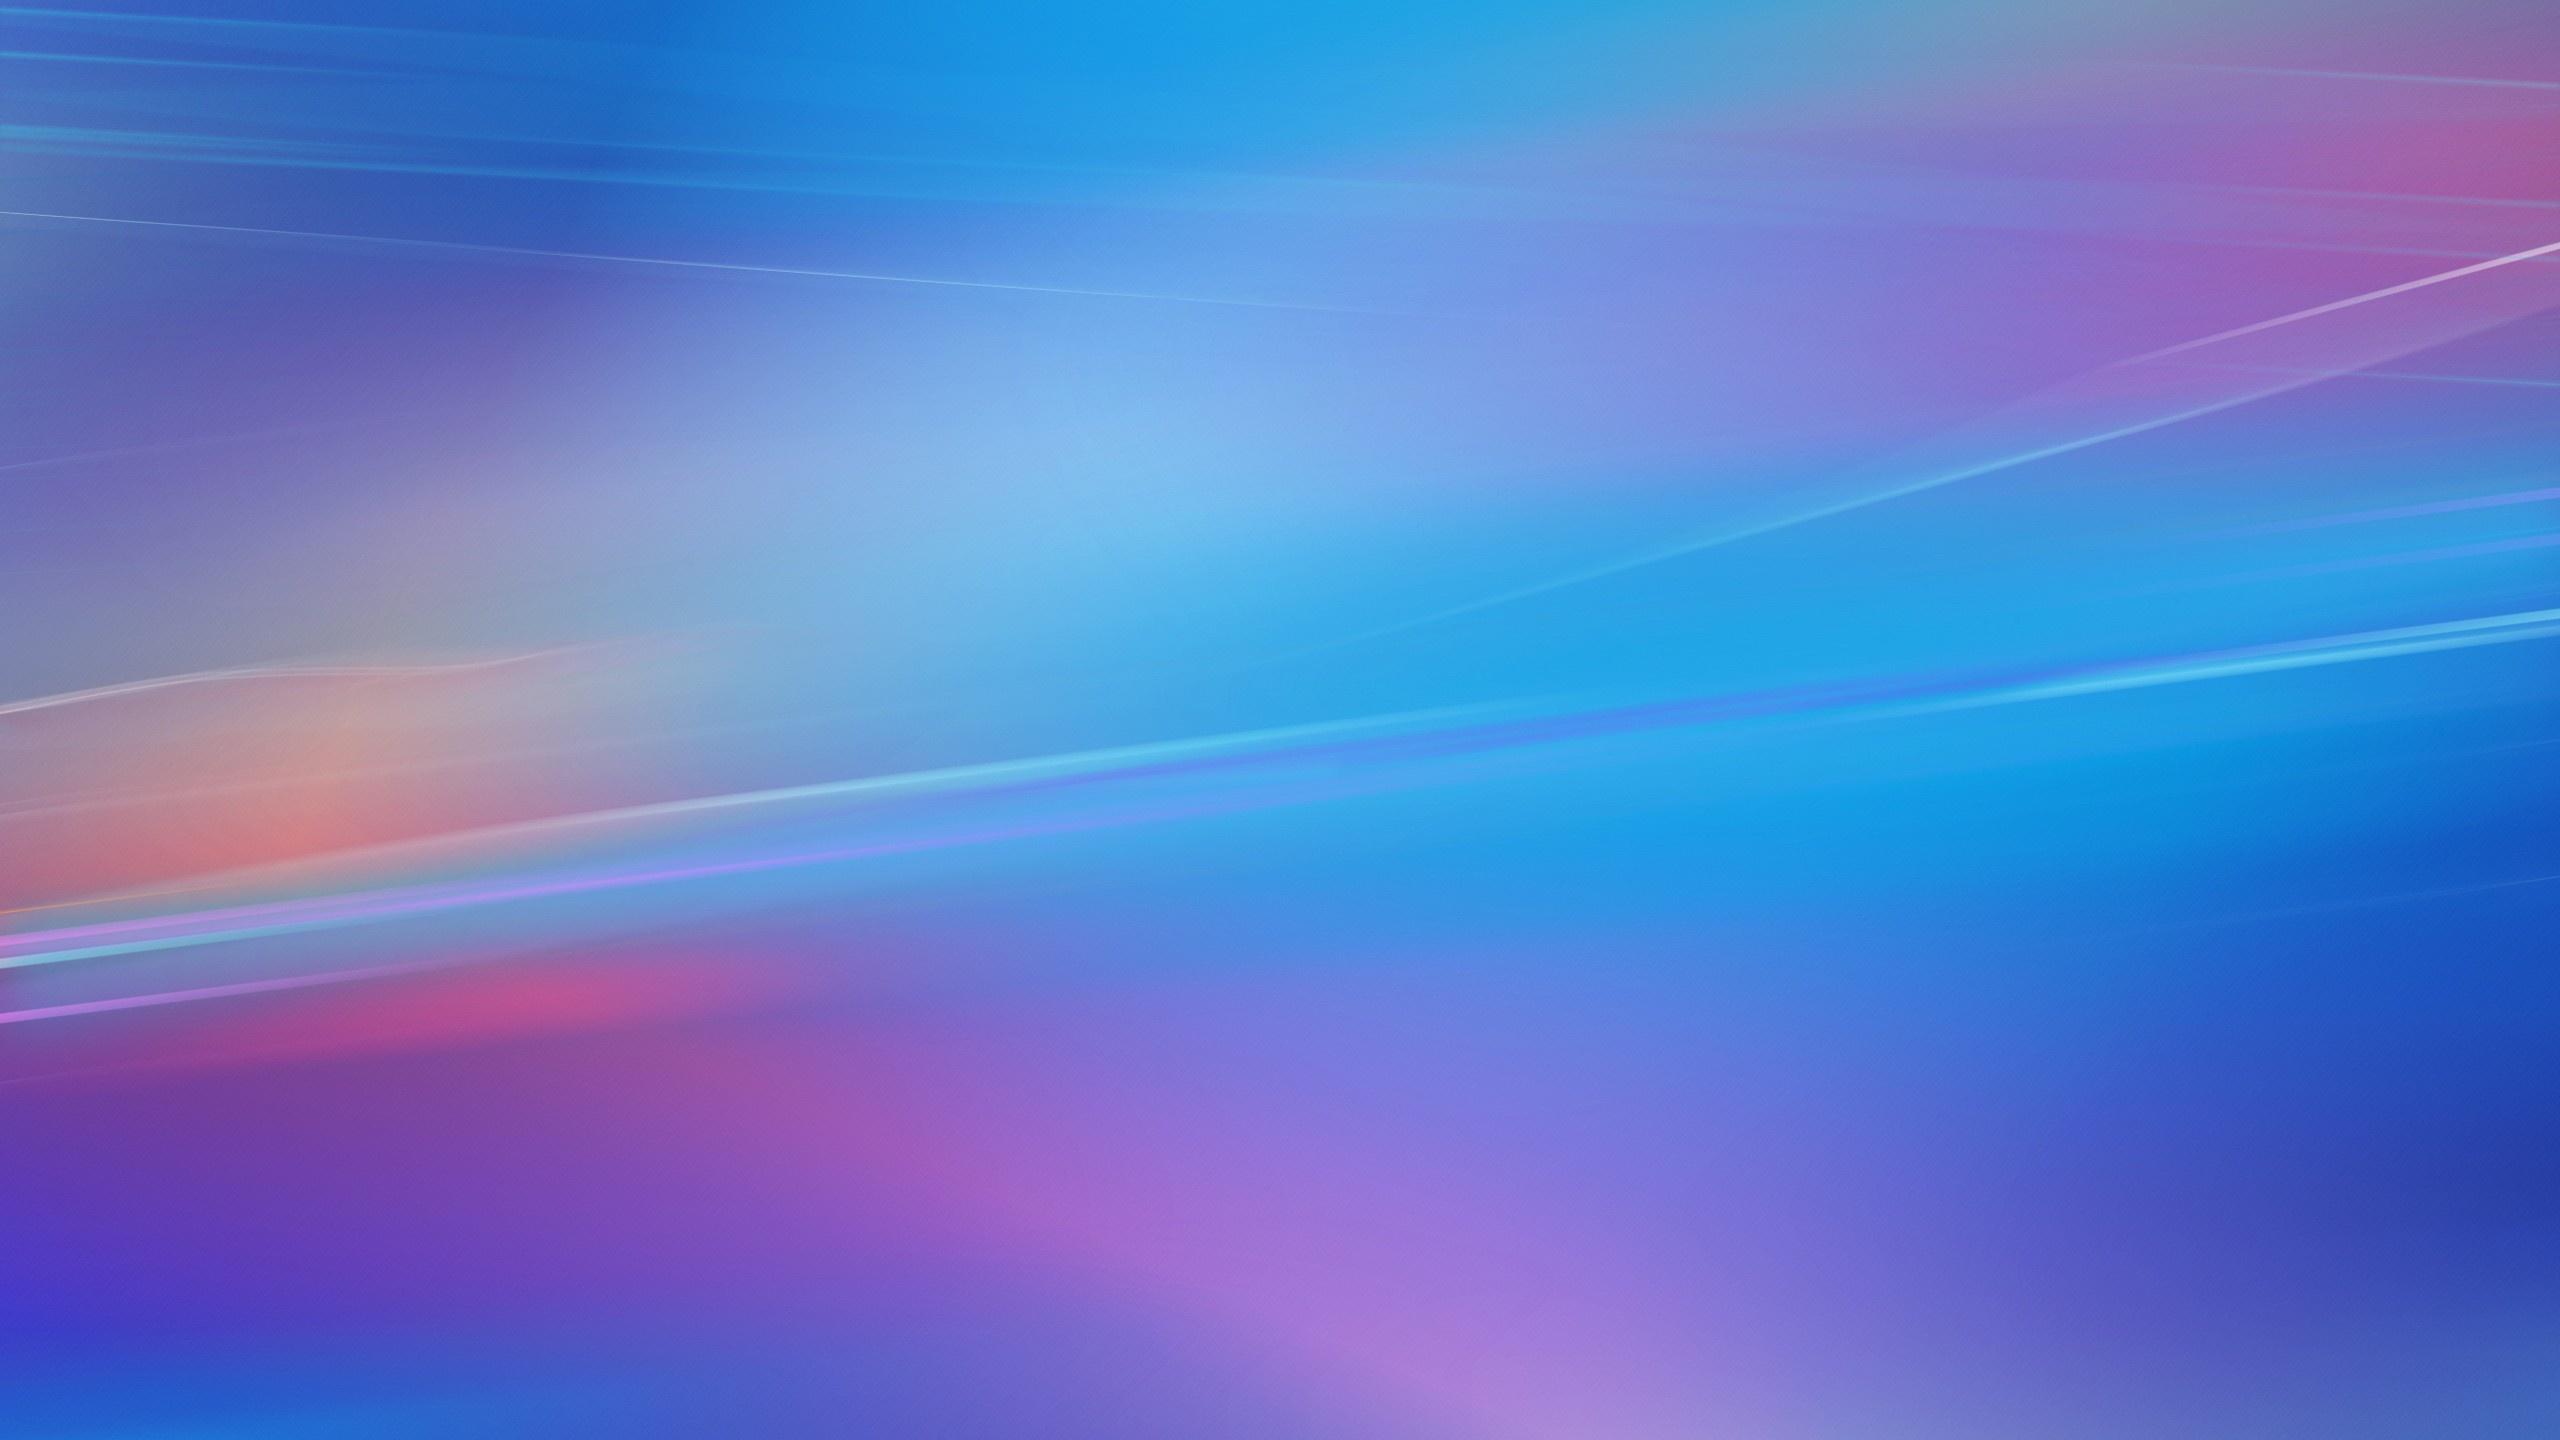 Blue Screen Lines Wallpaper 2560x1440